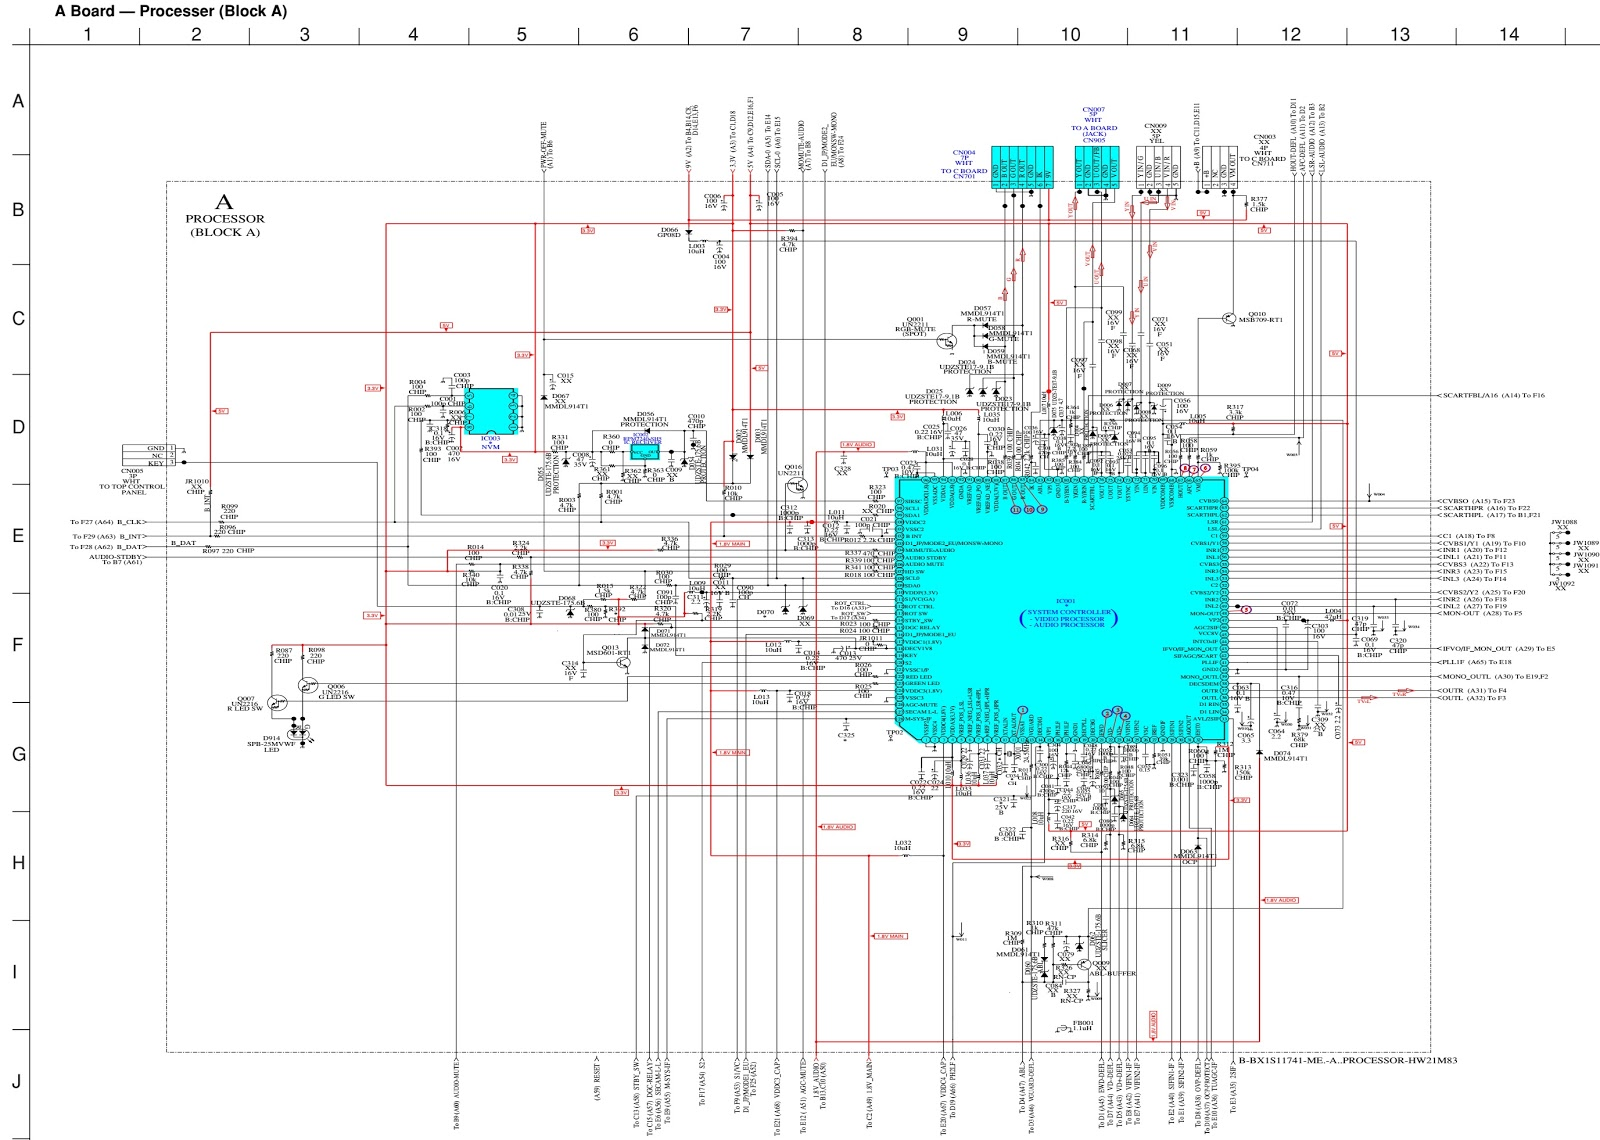 KV HW21M50 – Sony Trinitron CRT TV – Circuit Diagram